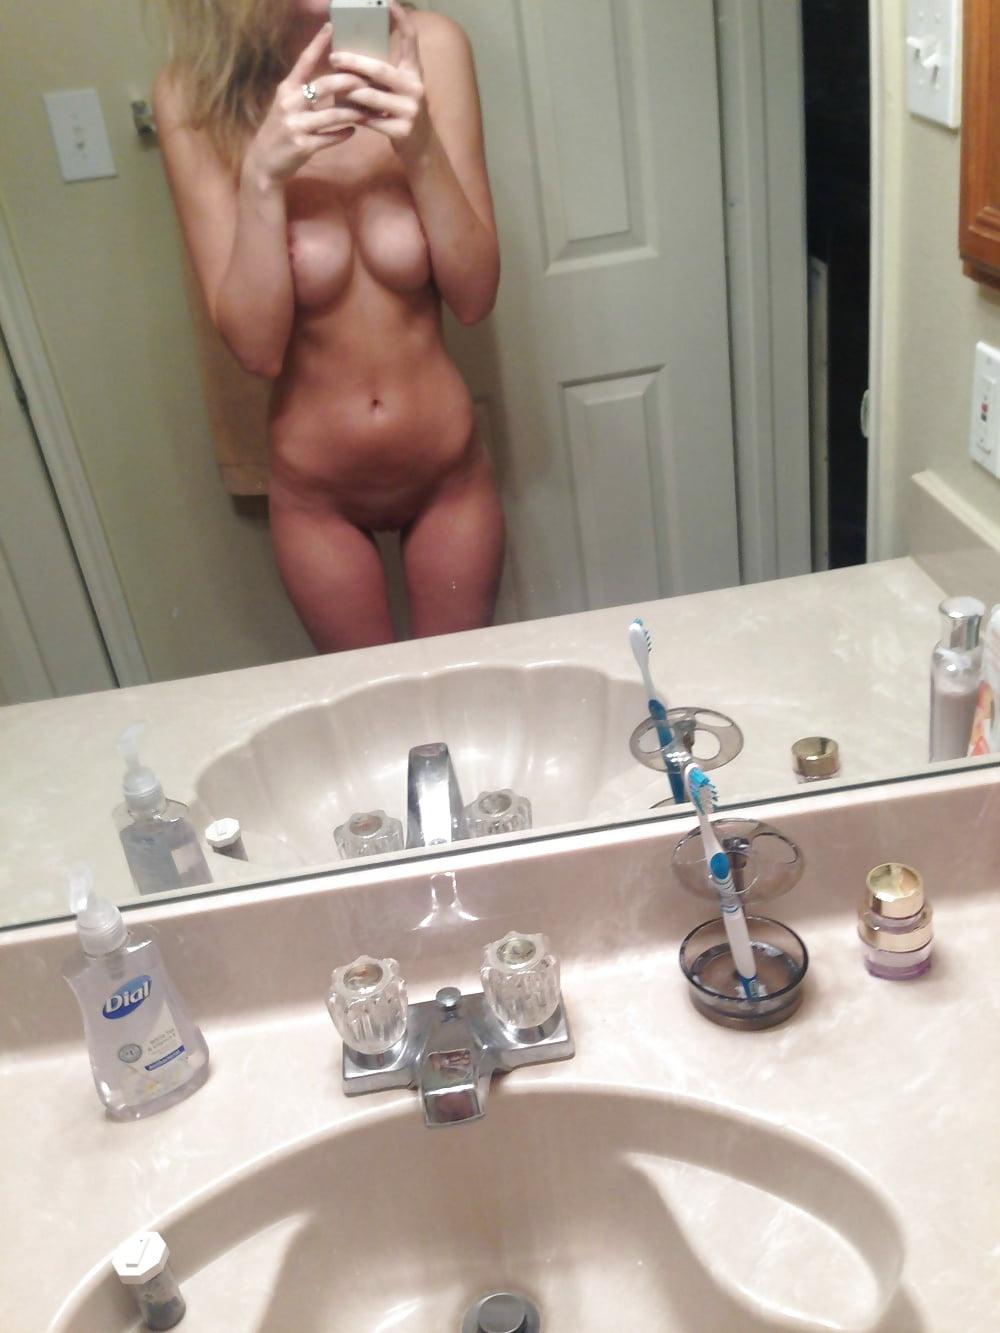 Blonde Teen Nude Iphone Selfies - 22 Pics - Xhamstercom-8822